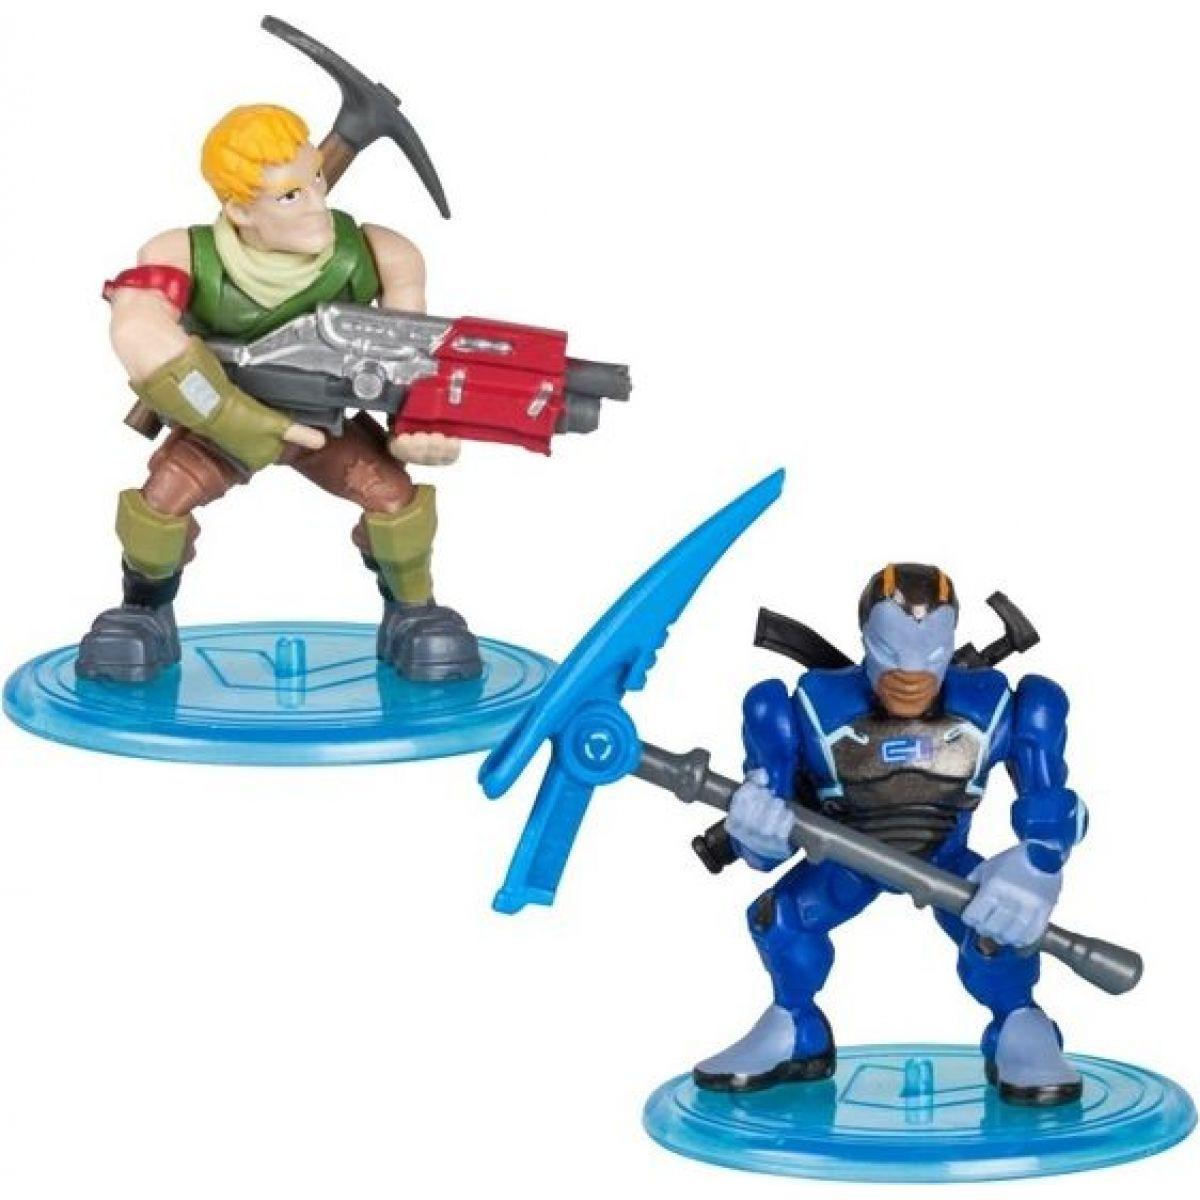 Sada 2 figurky Fortnite W1 Sergeant Jonesy a Carbide